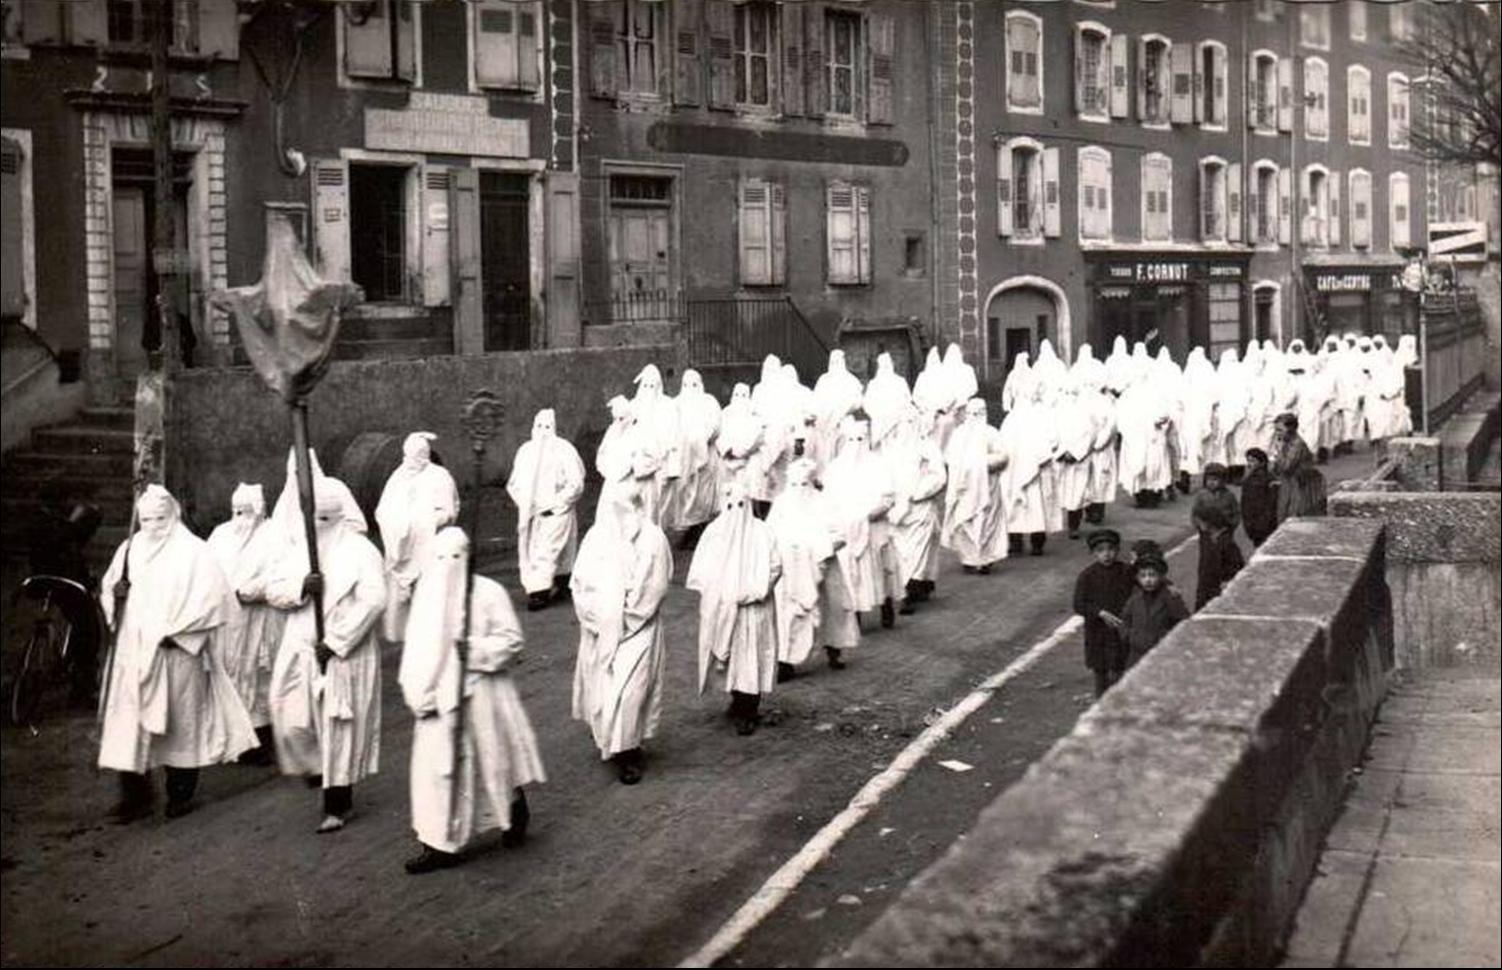 Les pénitents blancs de Saugues